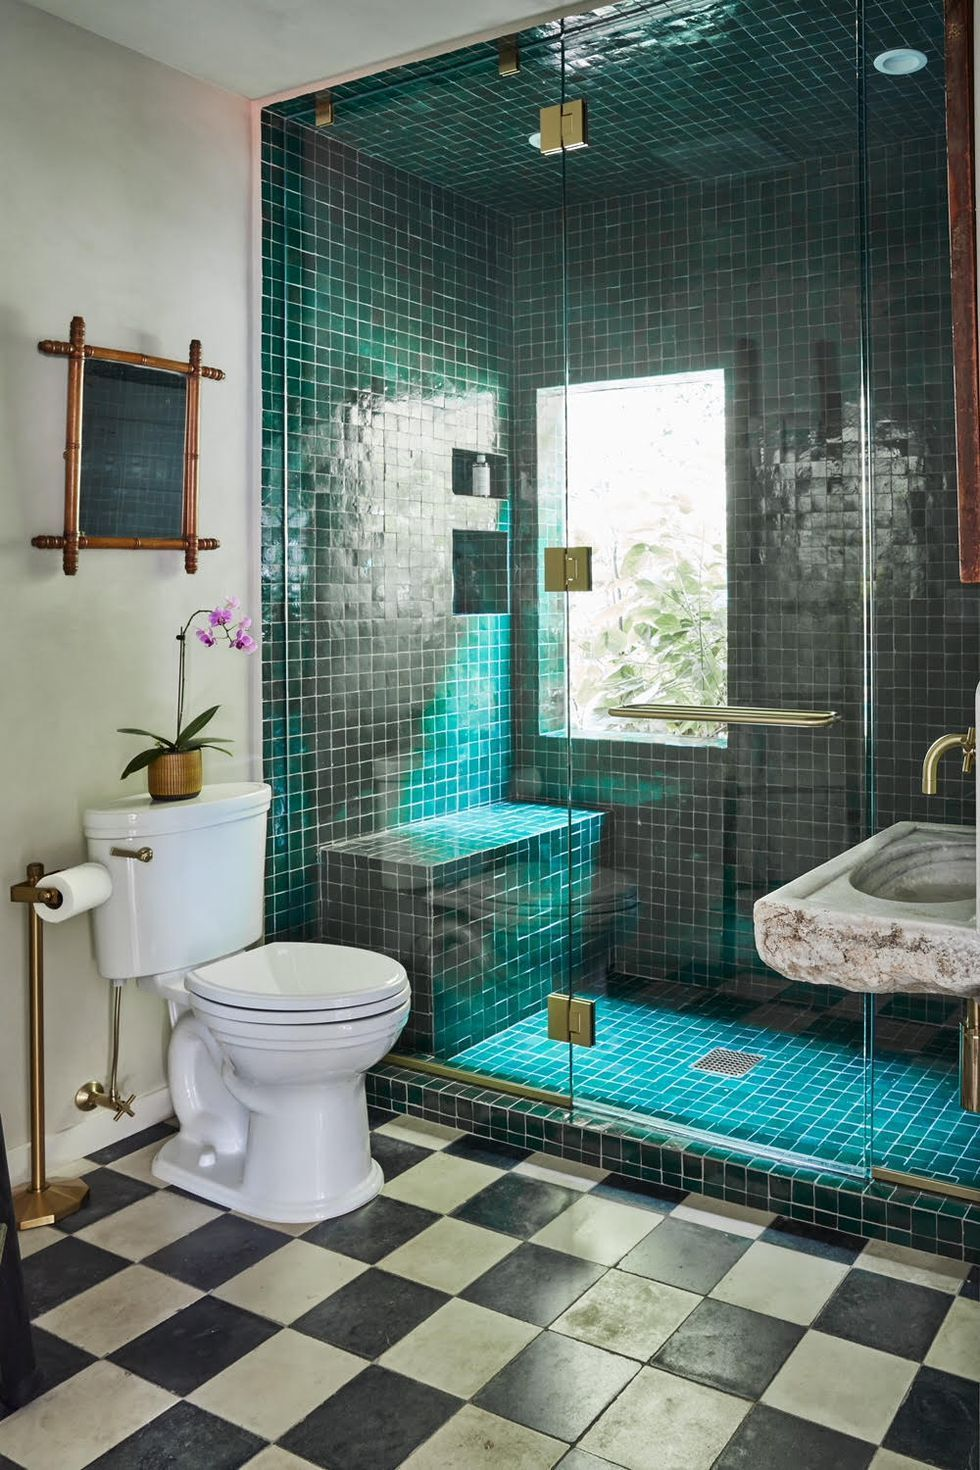 Bathroom with green tiles   BATHROOM - BLOG   Pinterest   Spanish ...